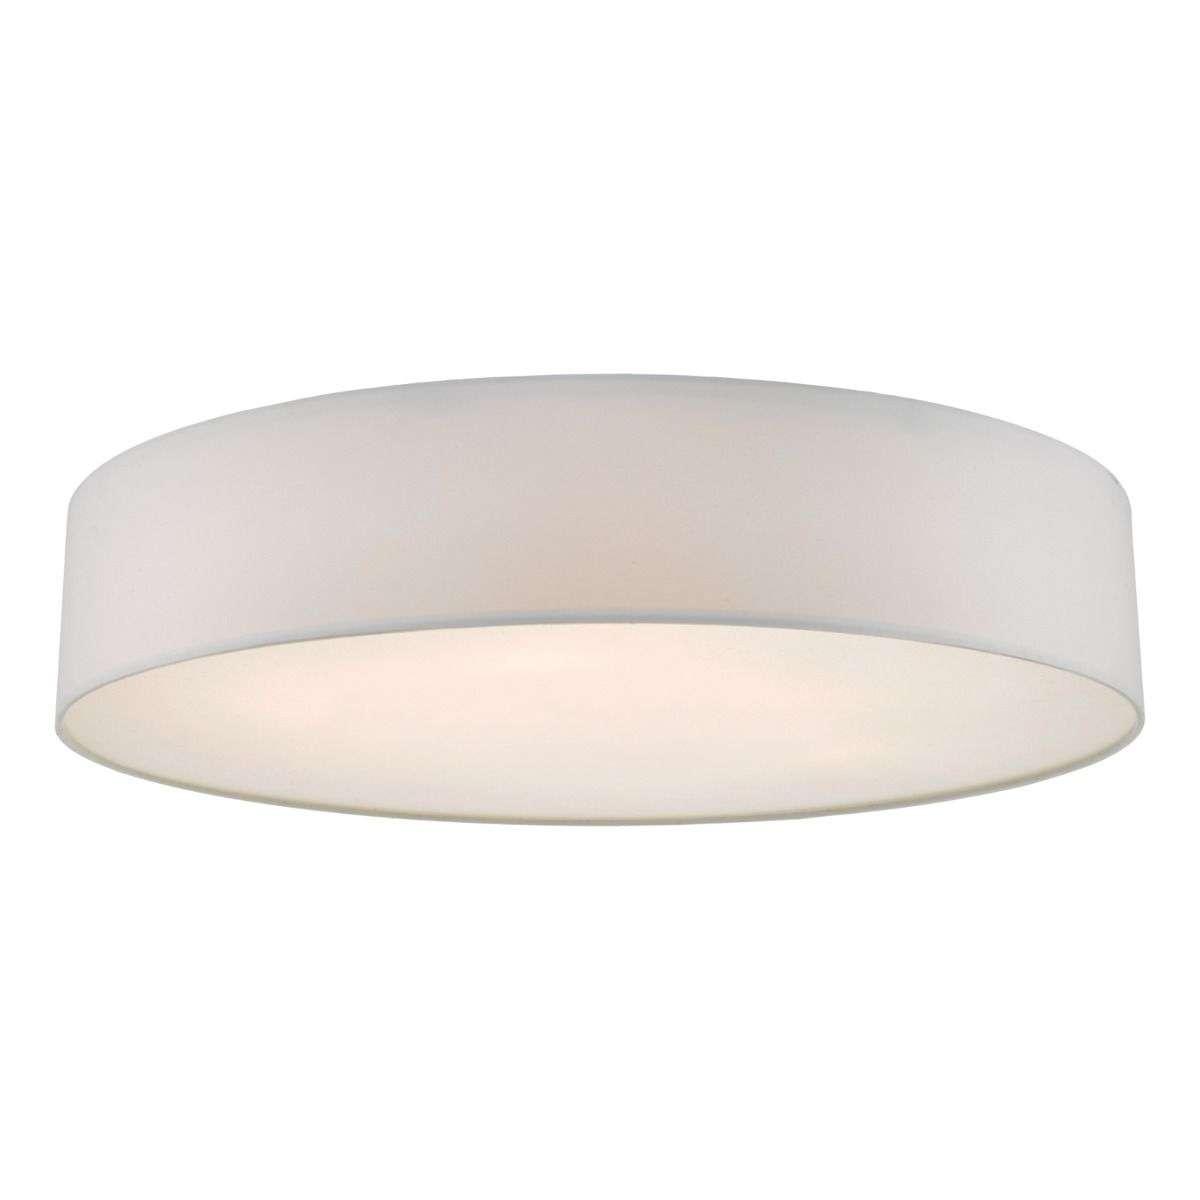 Cierro 6 Light Flush Fitting in Ivory